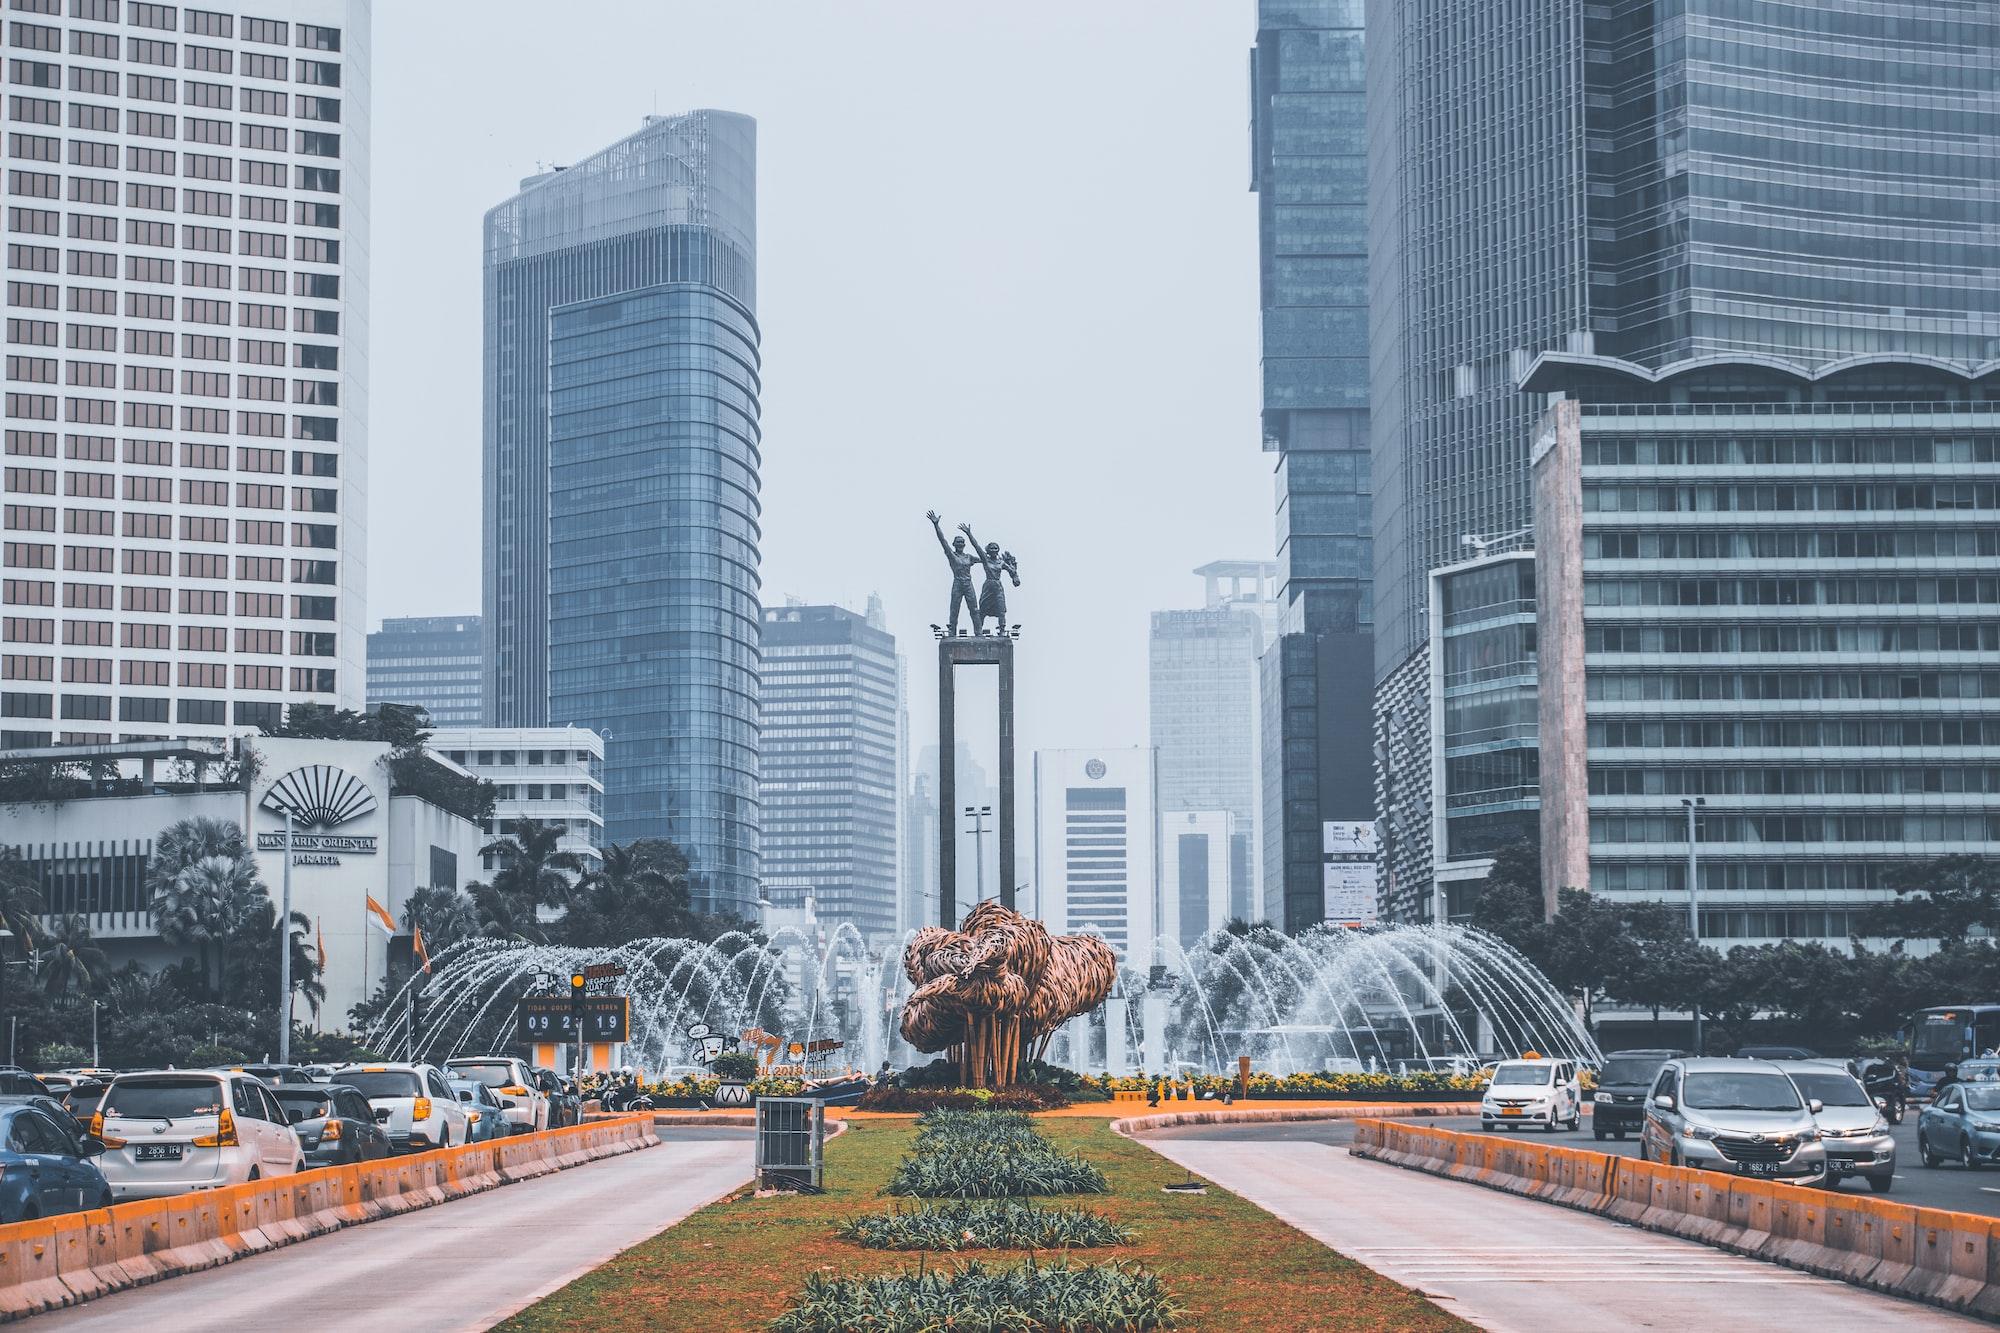 crowded traffic around welcoming statue